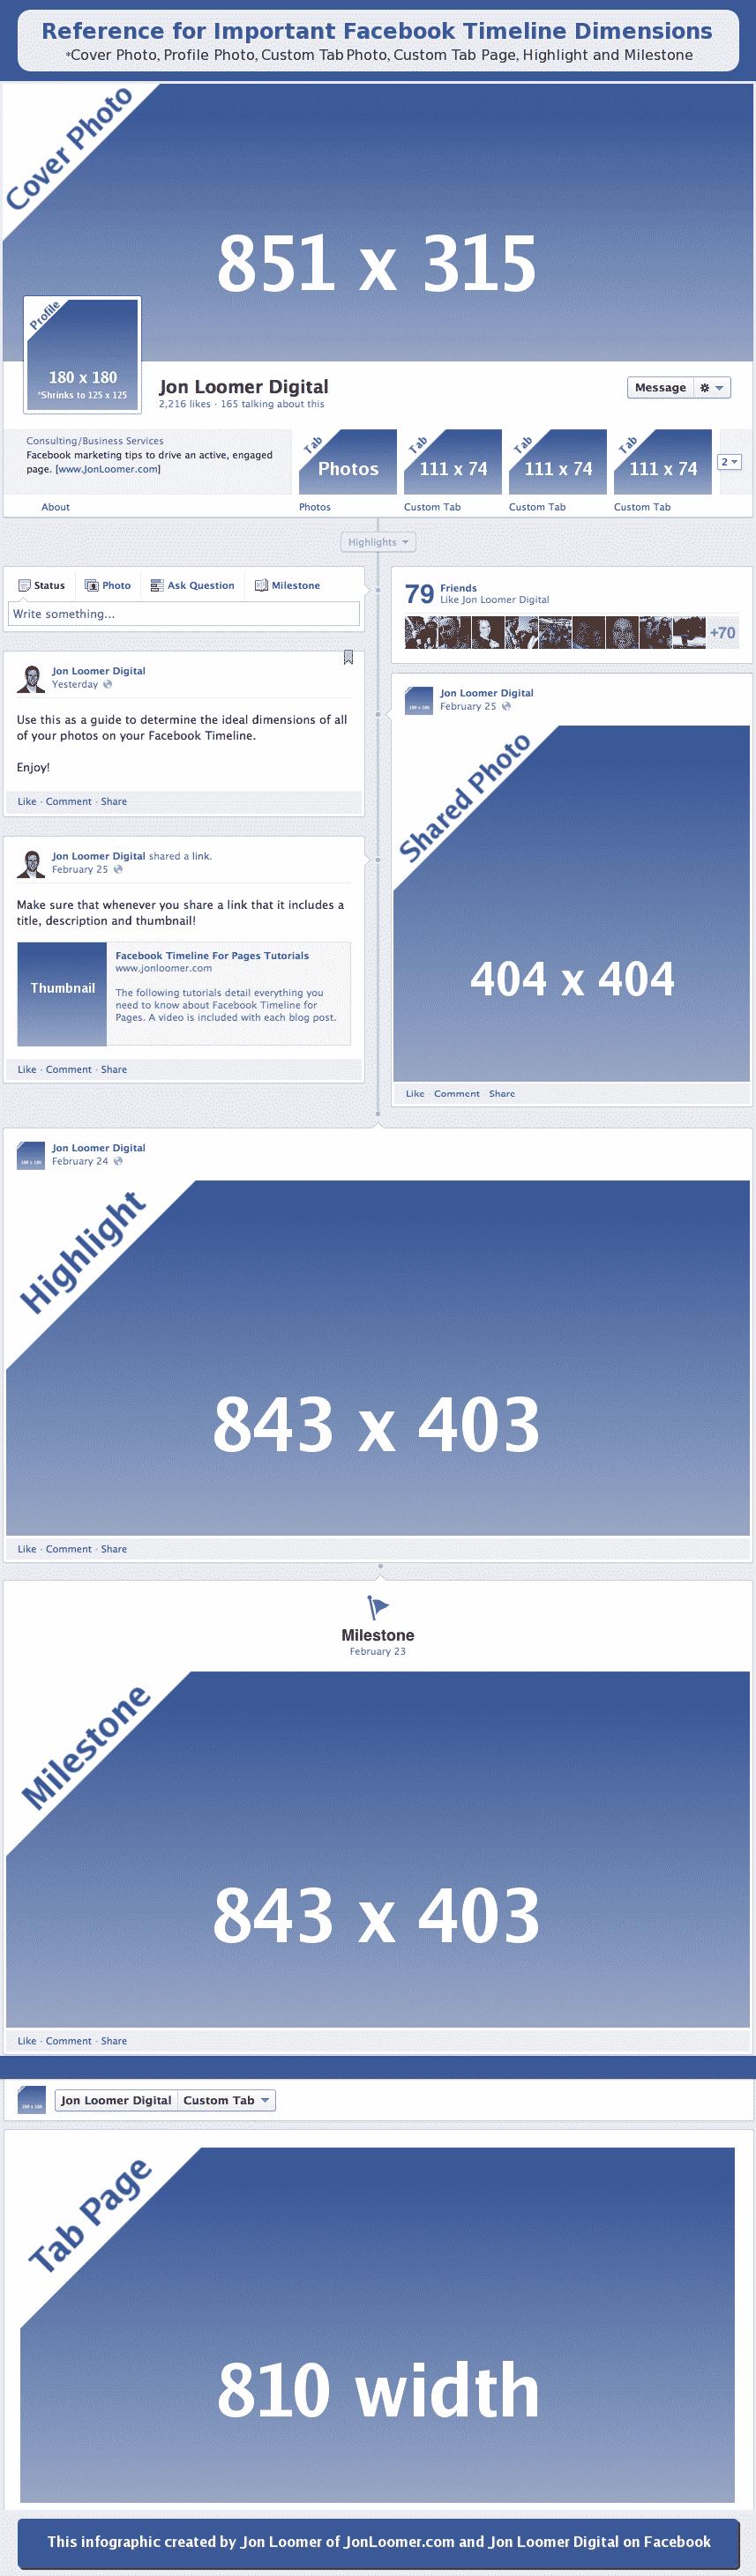 facebook timeline page dimensions